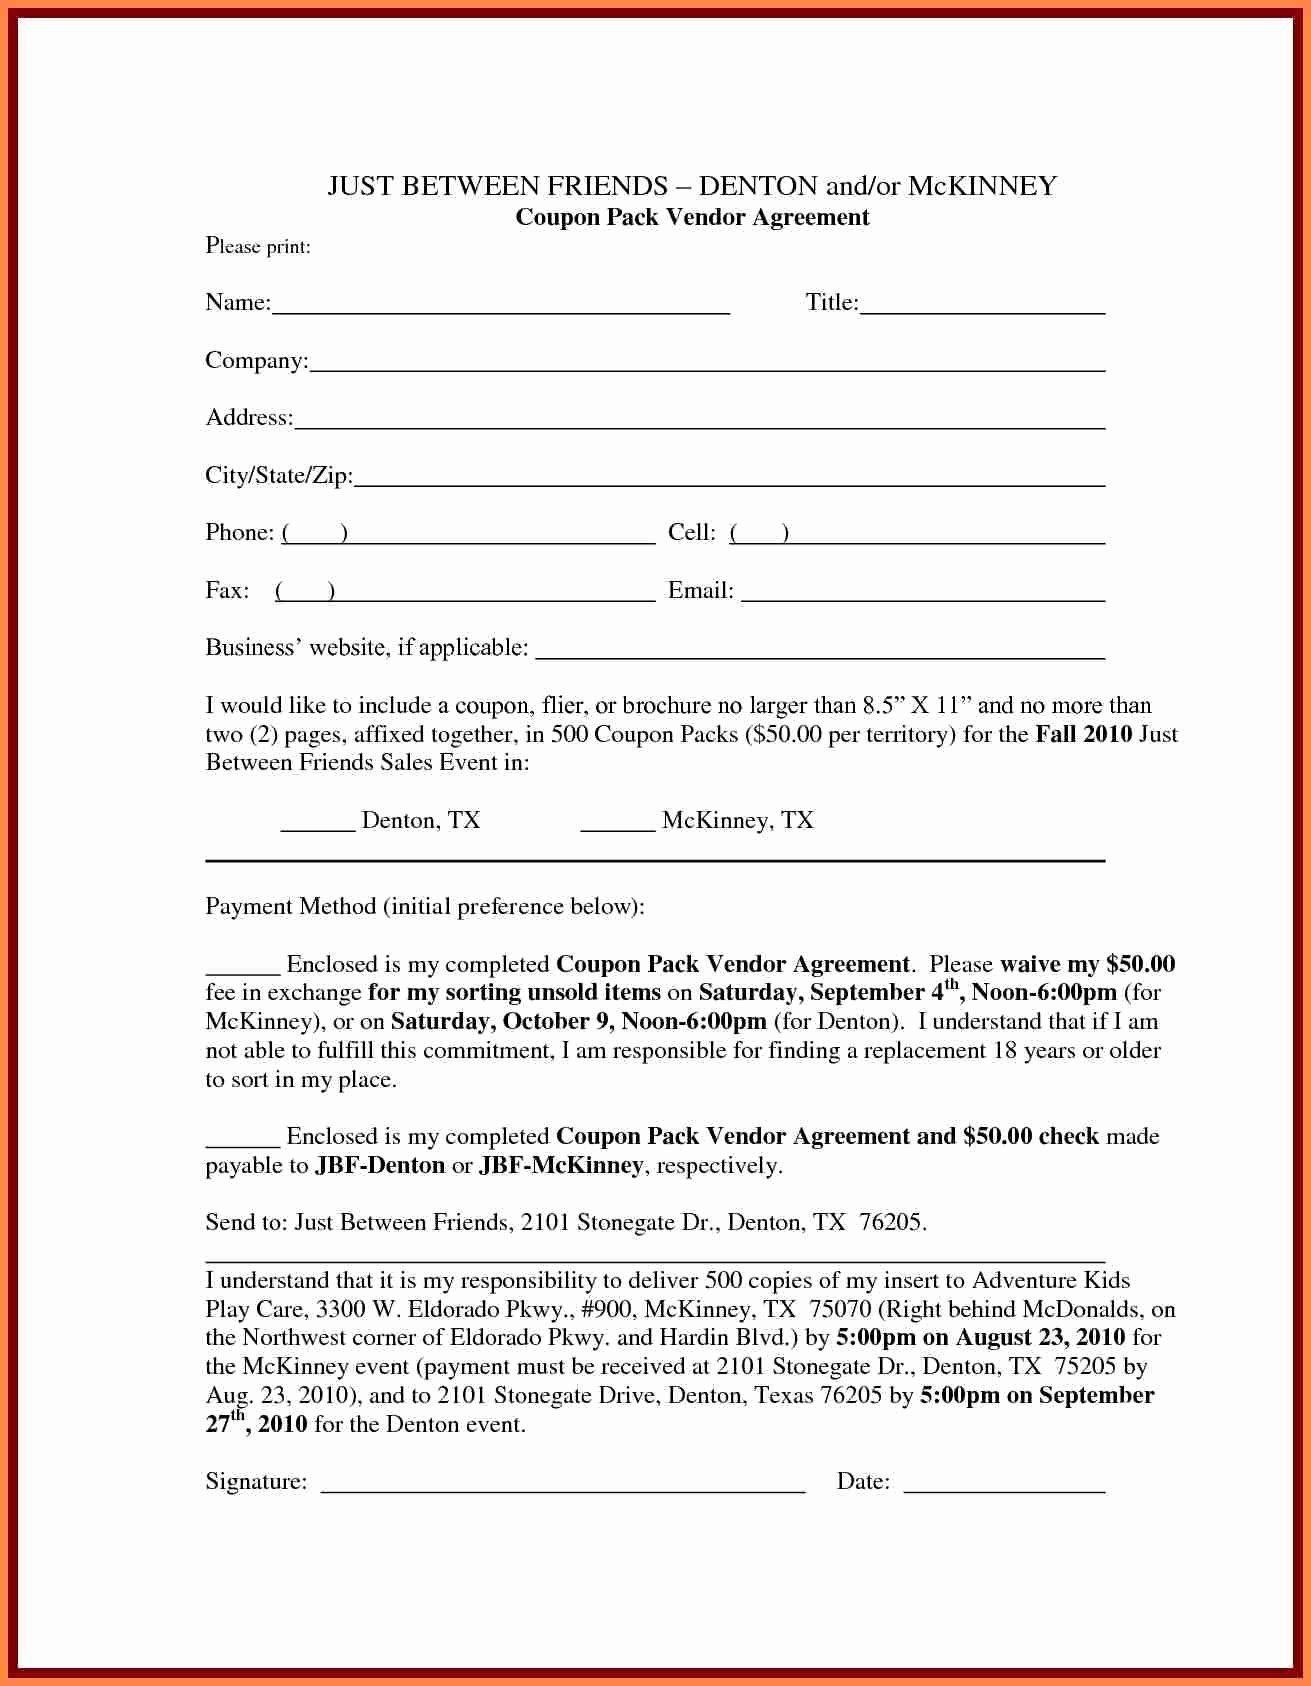 10 Loan Agreement Between Family Members Template